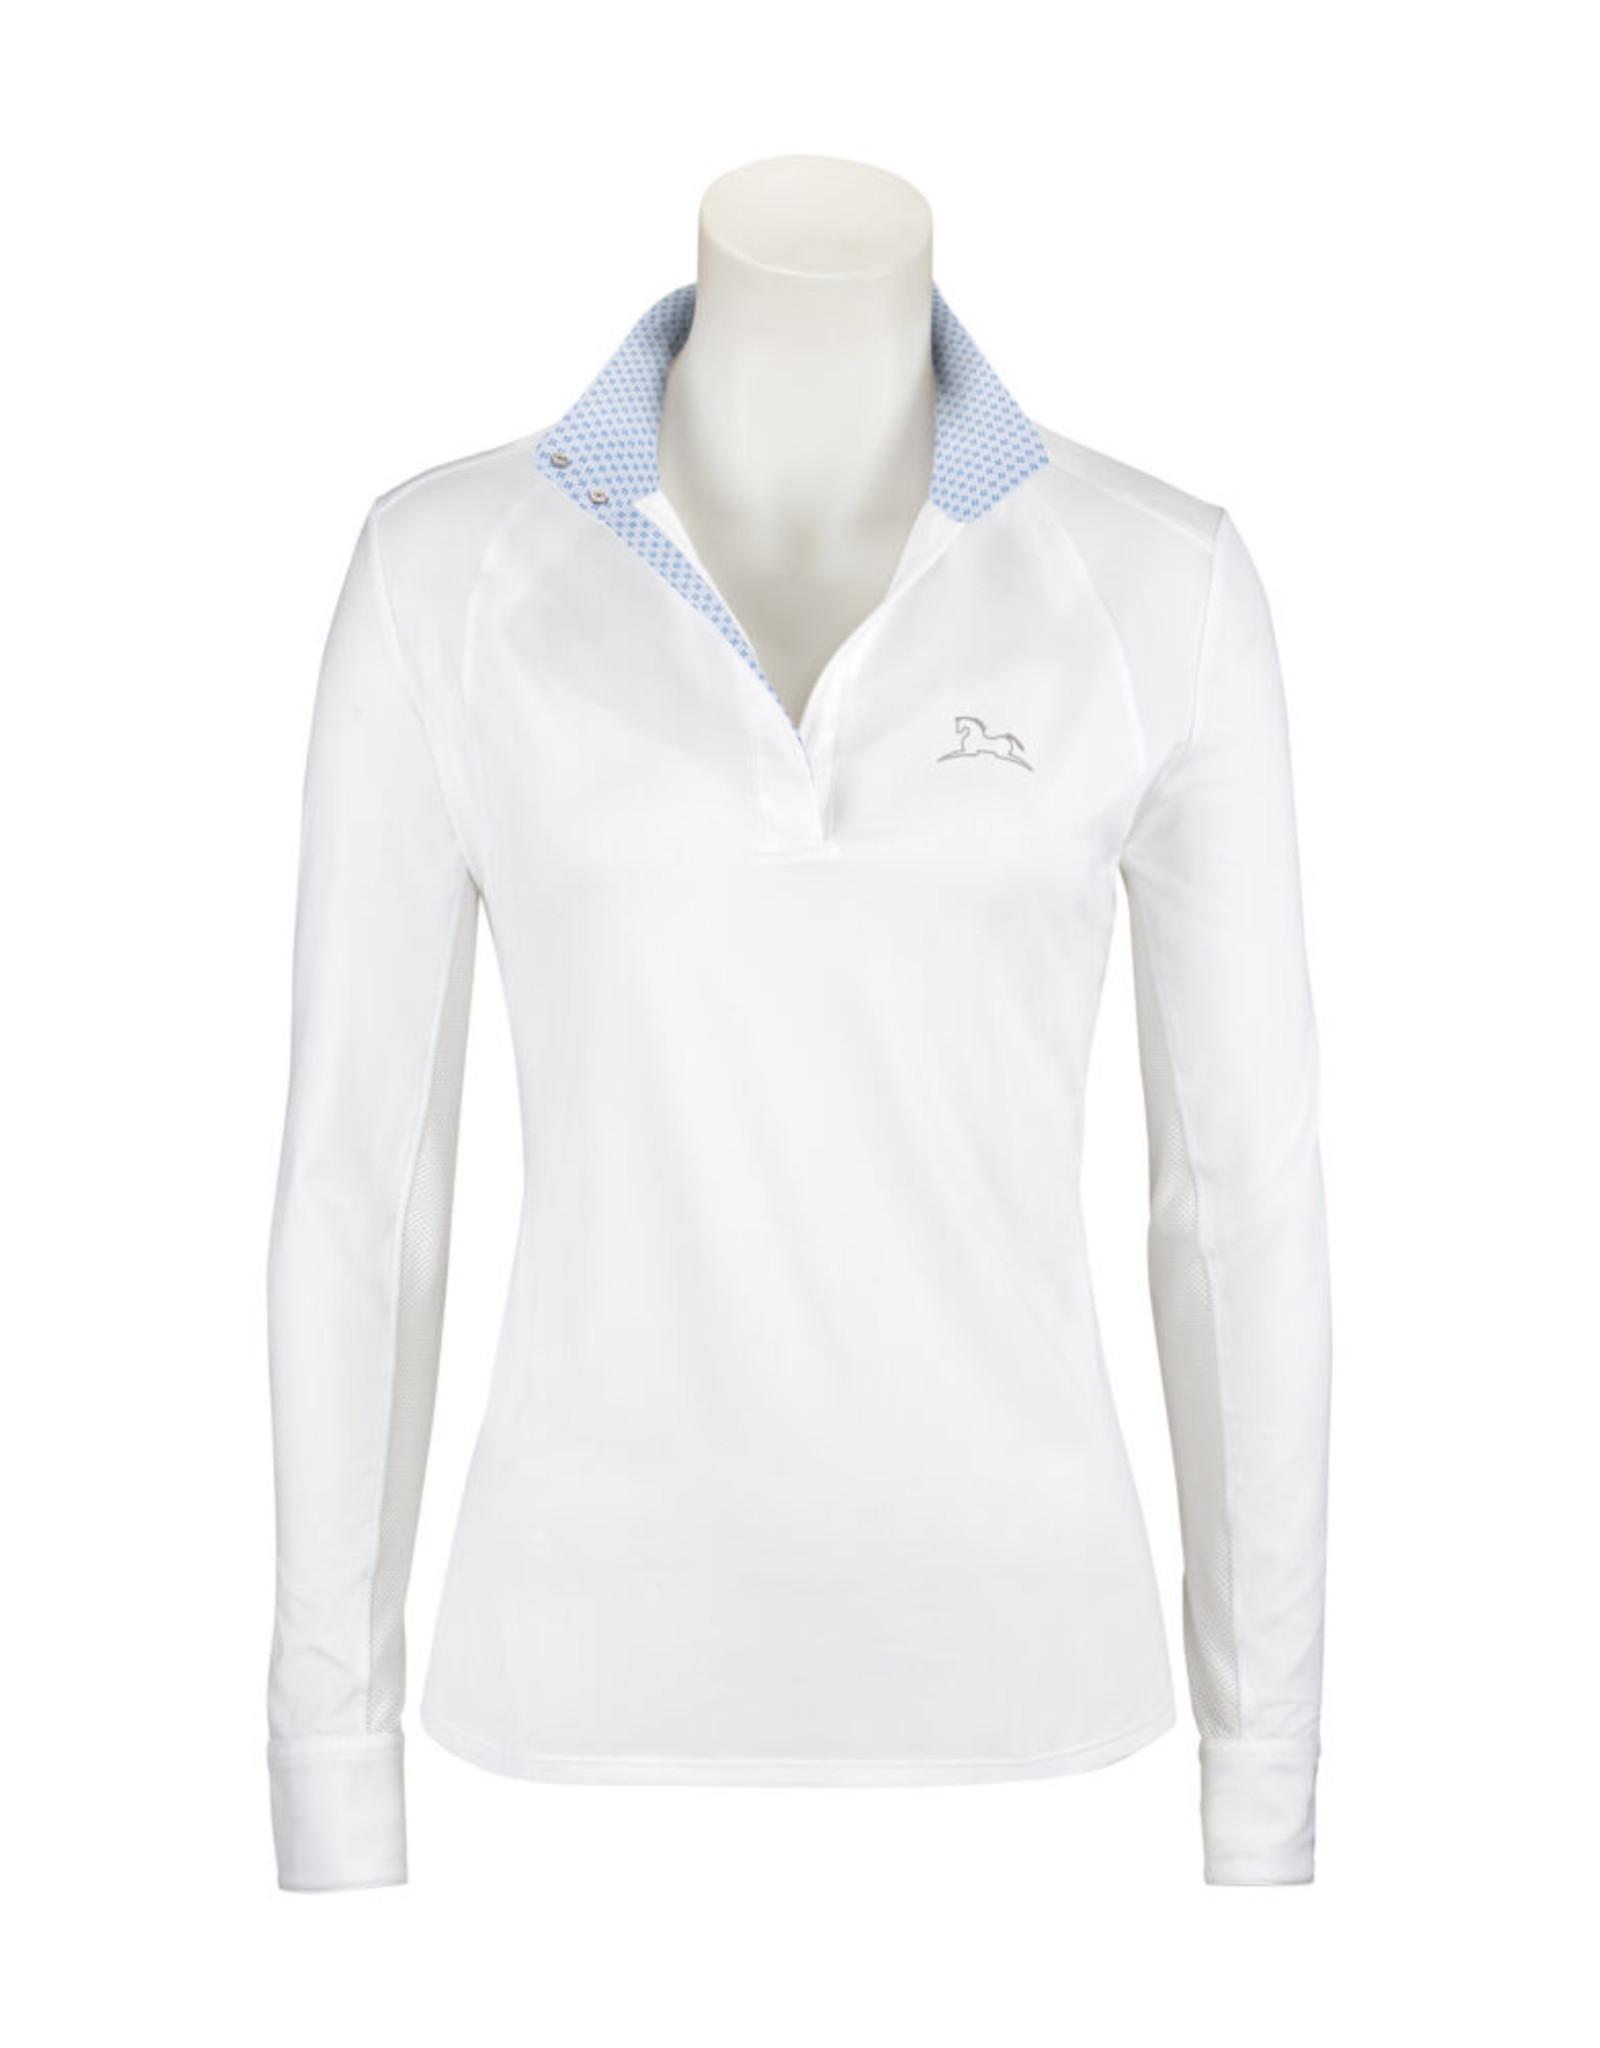 R.J. CLASSICS Maddie 37.5 Show Shirt